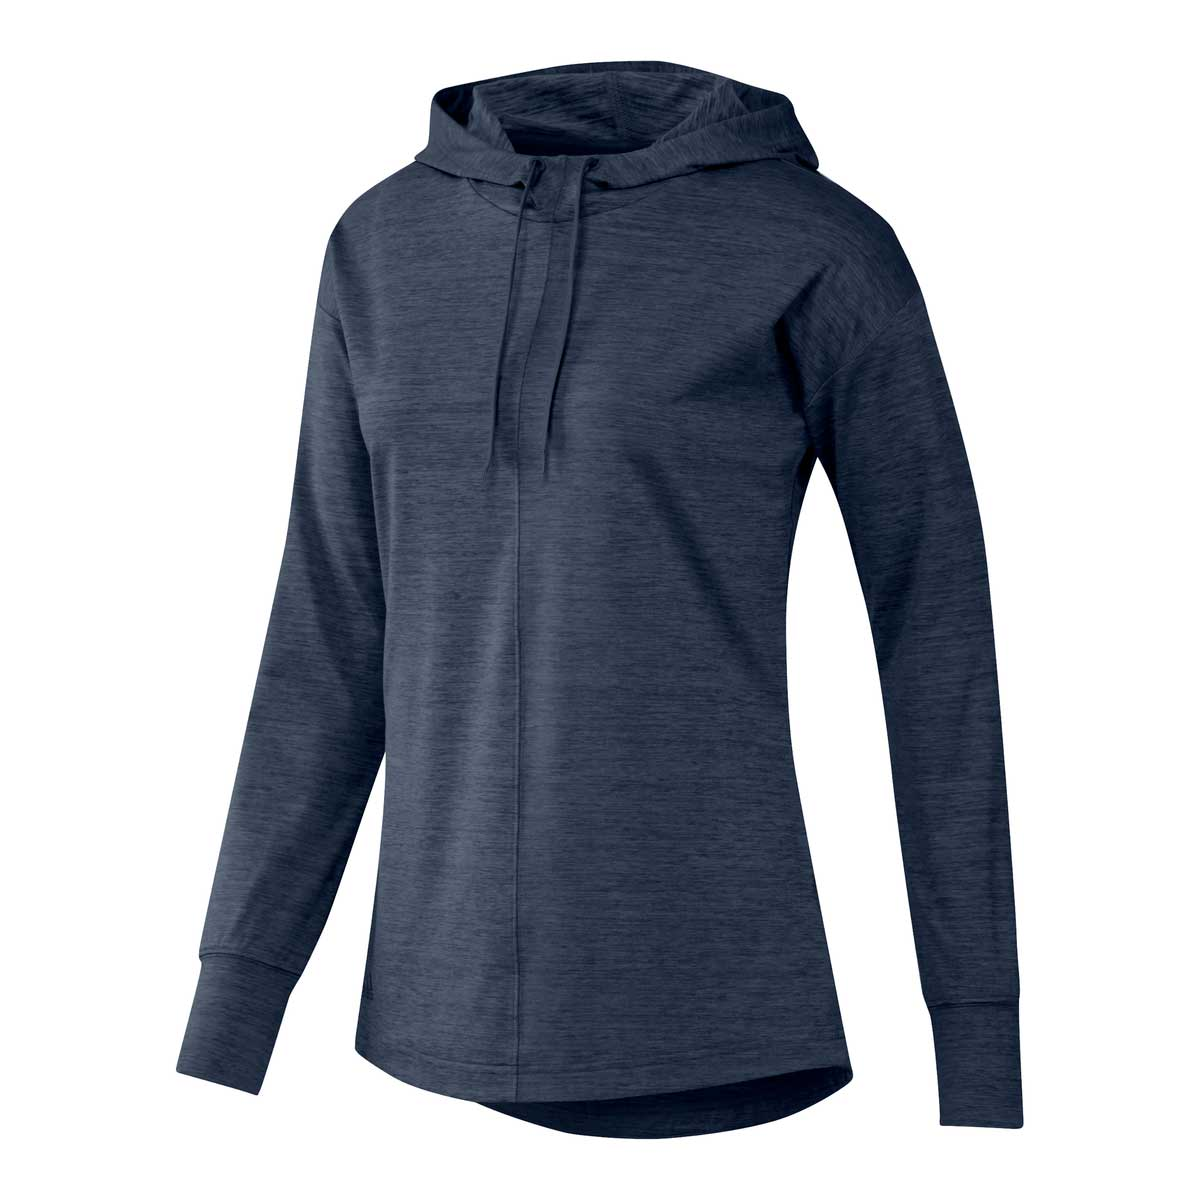 Adidas Women's Essentials Heathered Crew Navy Hoodie Pullover